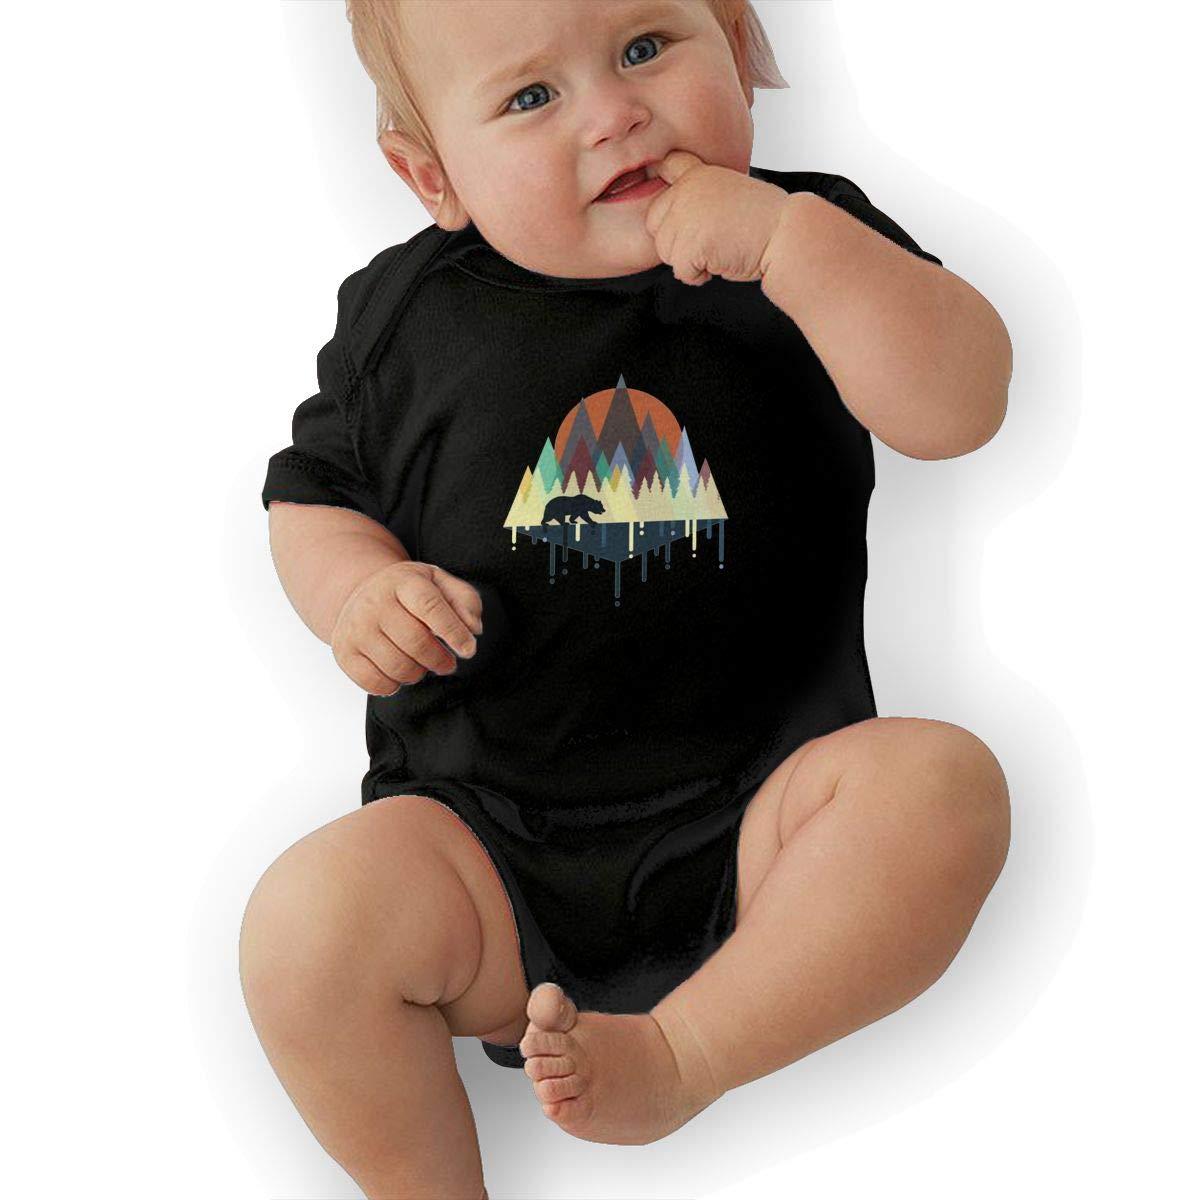 Coollifea Bear Trail Baby Romper 0-18 Months Newborn Baby Girls Boys Layette Rompers Black